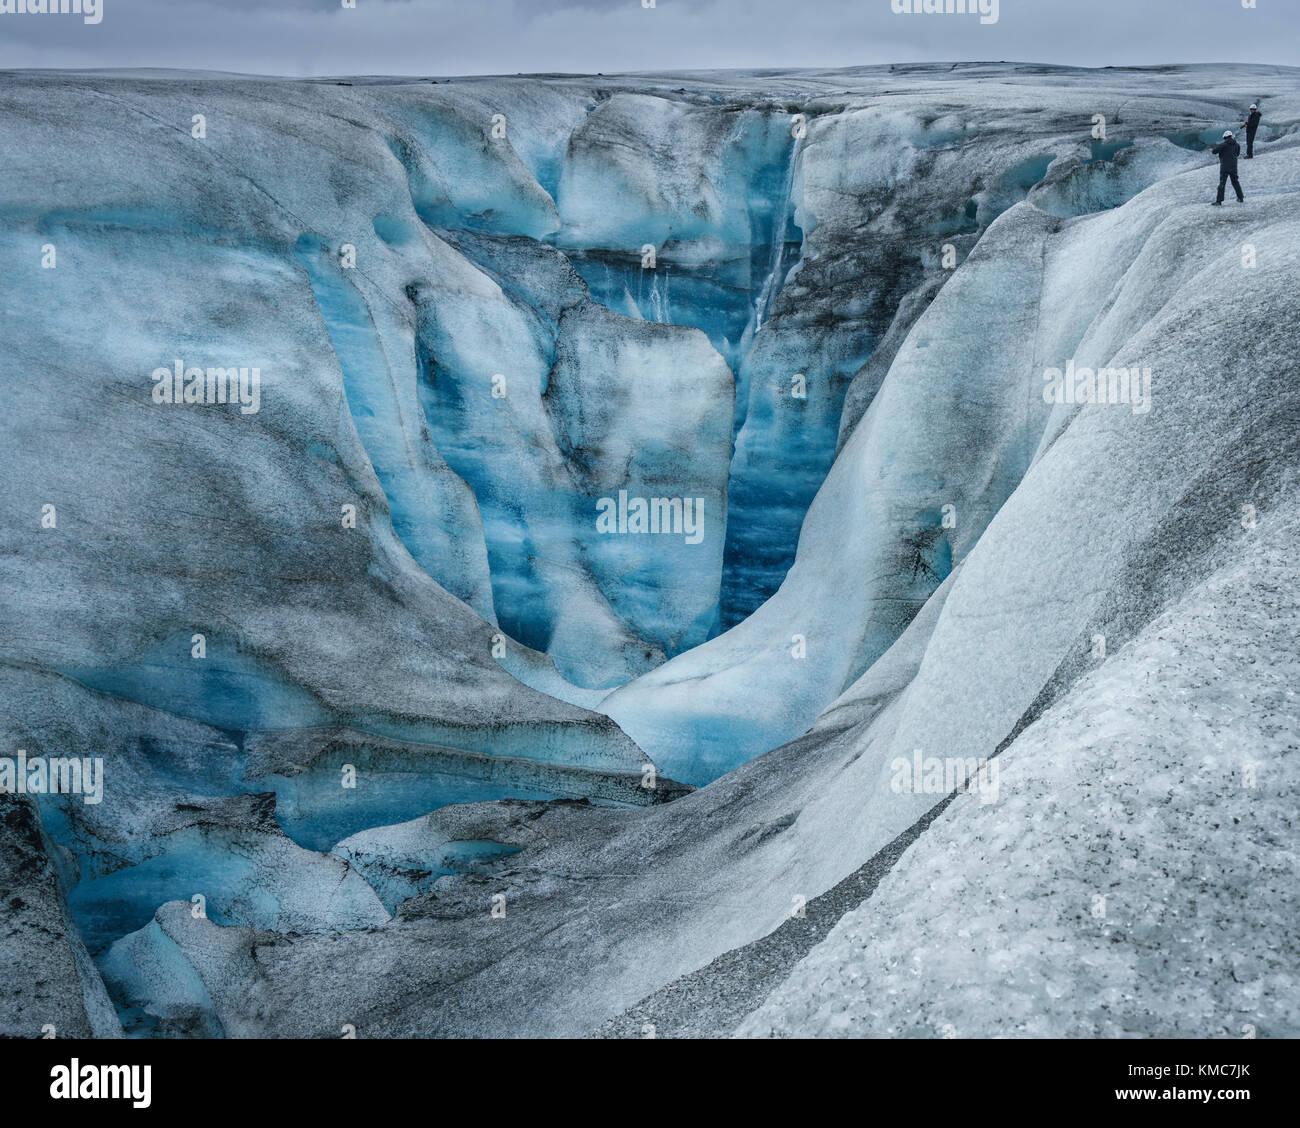 Breidamerkurjokull Glacier, Iceland - Stock Image